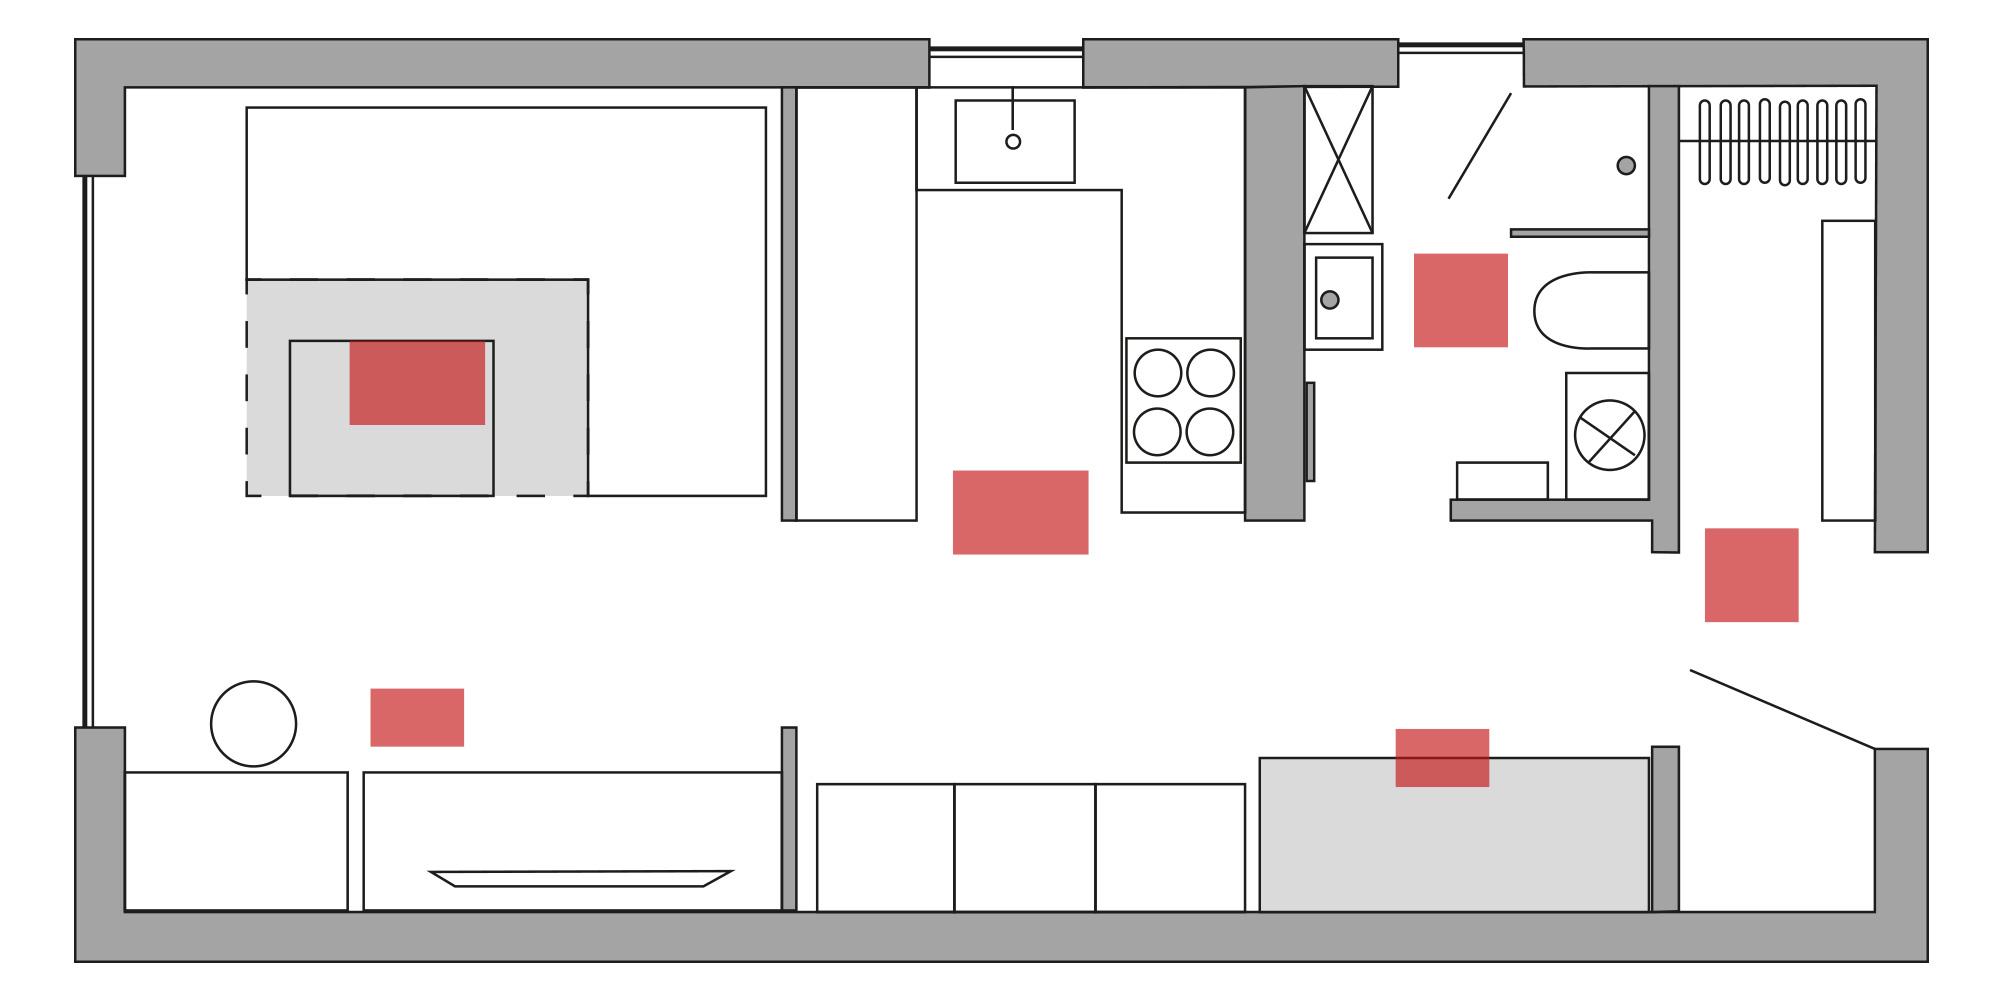 Tiny House Heizung Positionierung bei mittelmäßiger Gebäudedämmung